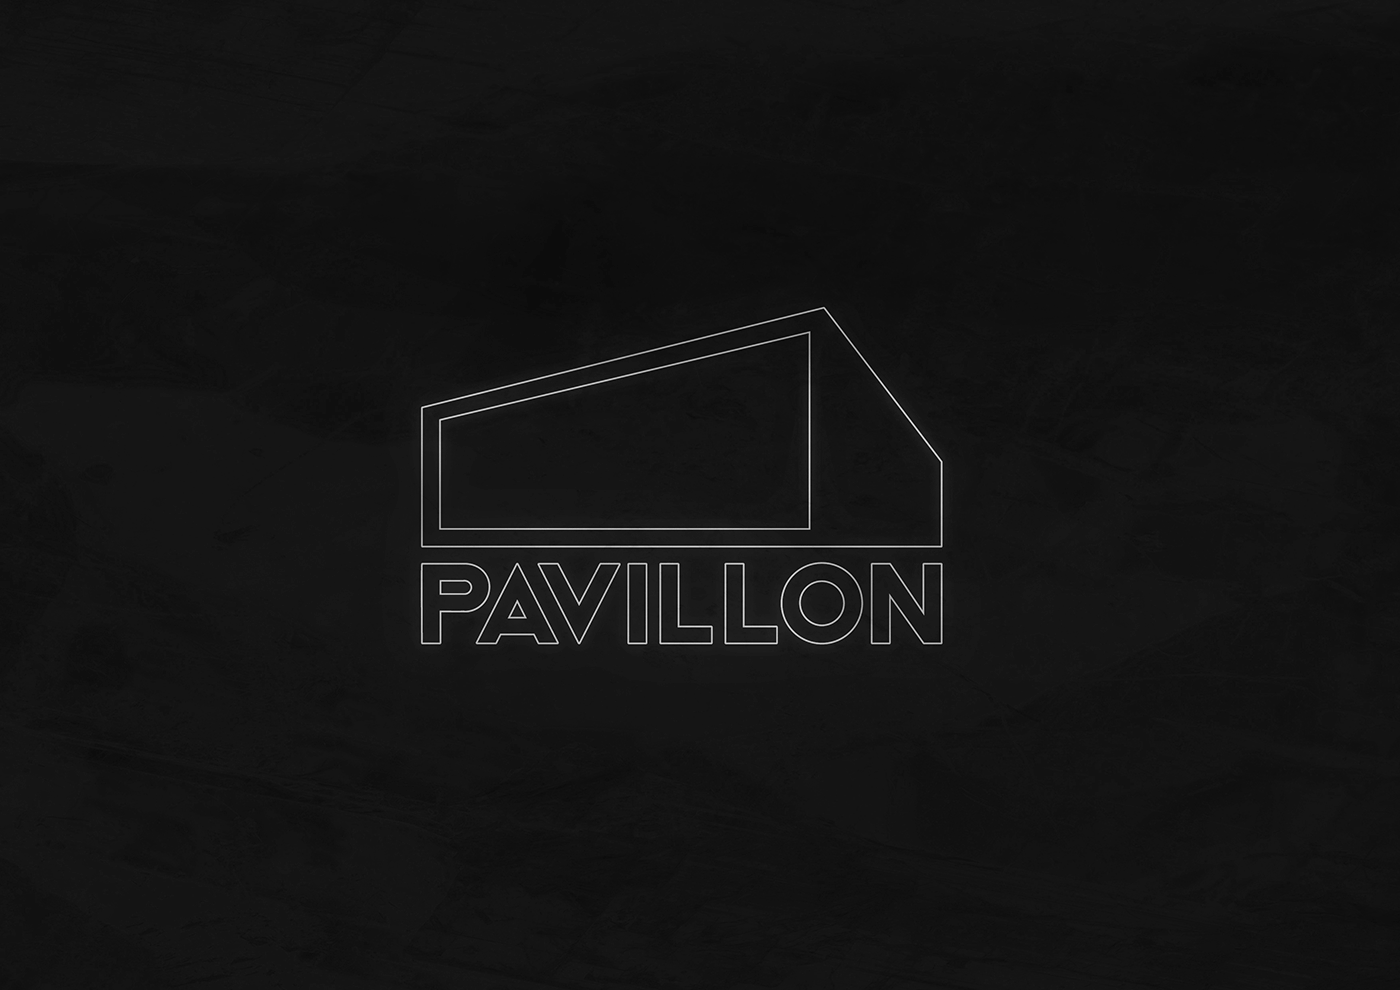 clvstr-sqsp-pavillon-page.png